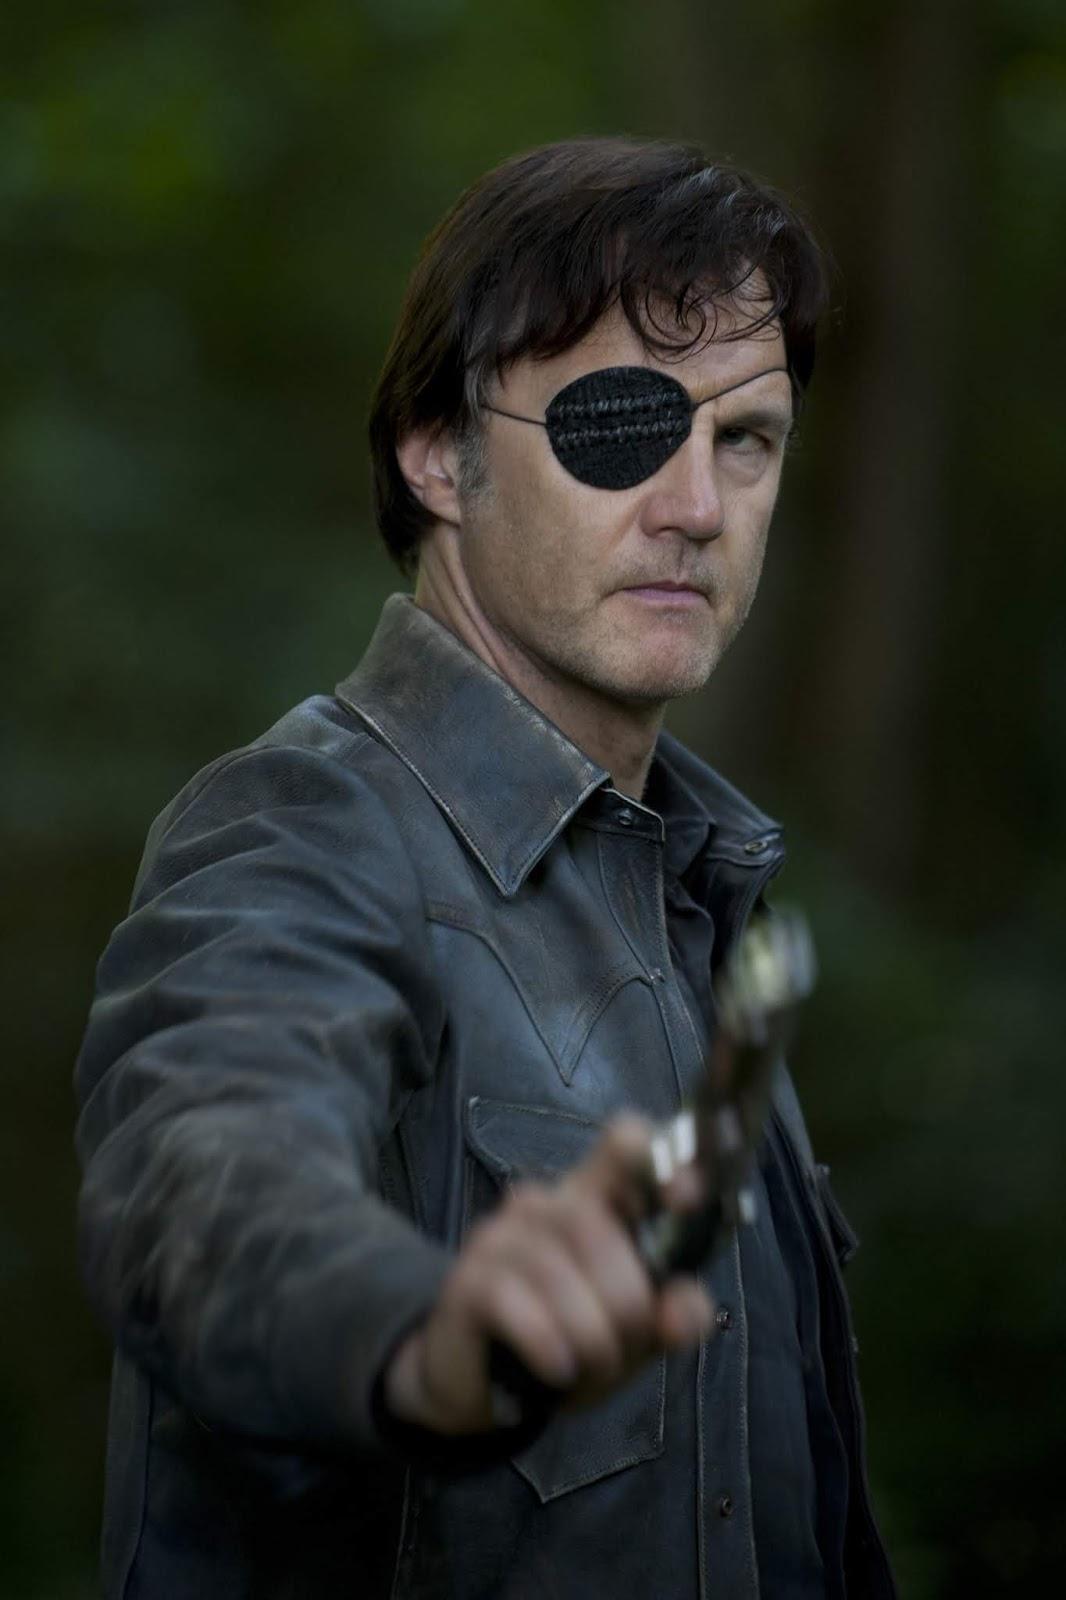 The Walking Dead El Actor Que Interpretó A El Gobernador Esta Interesado En Regresar A La Serie